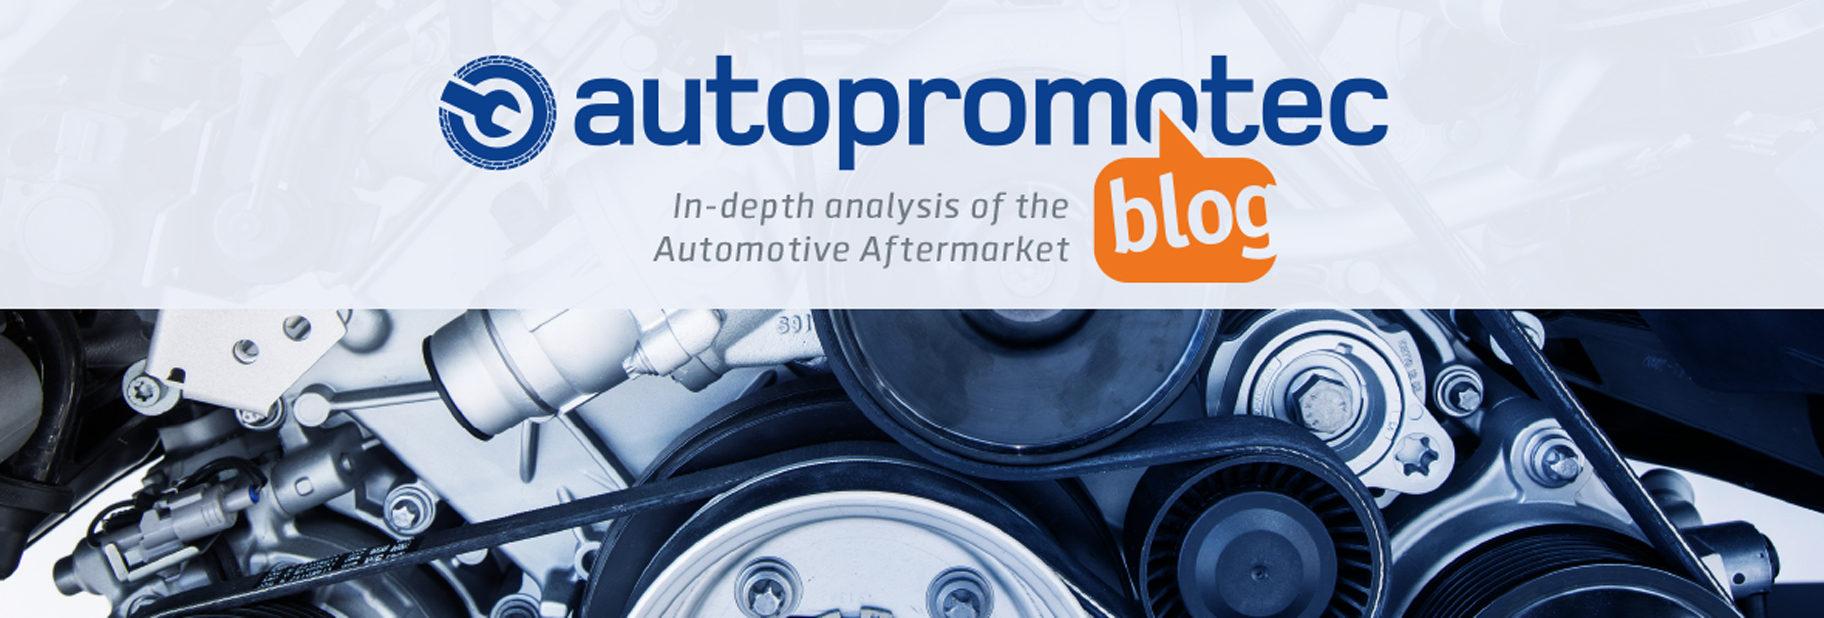 Ap19-Blog_header